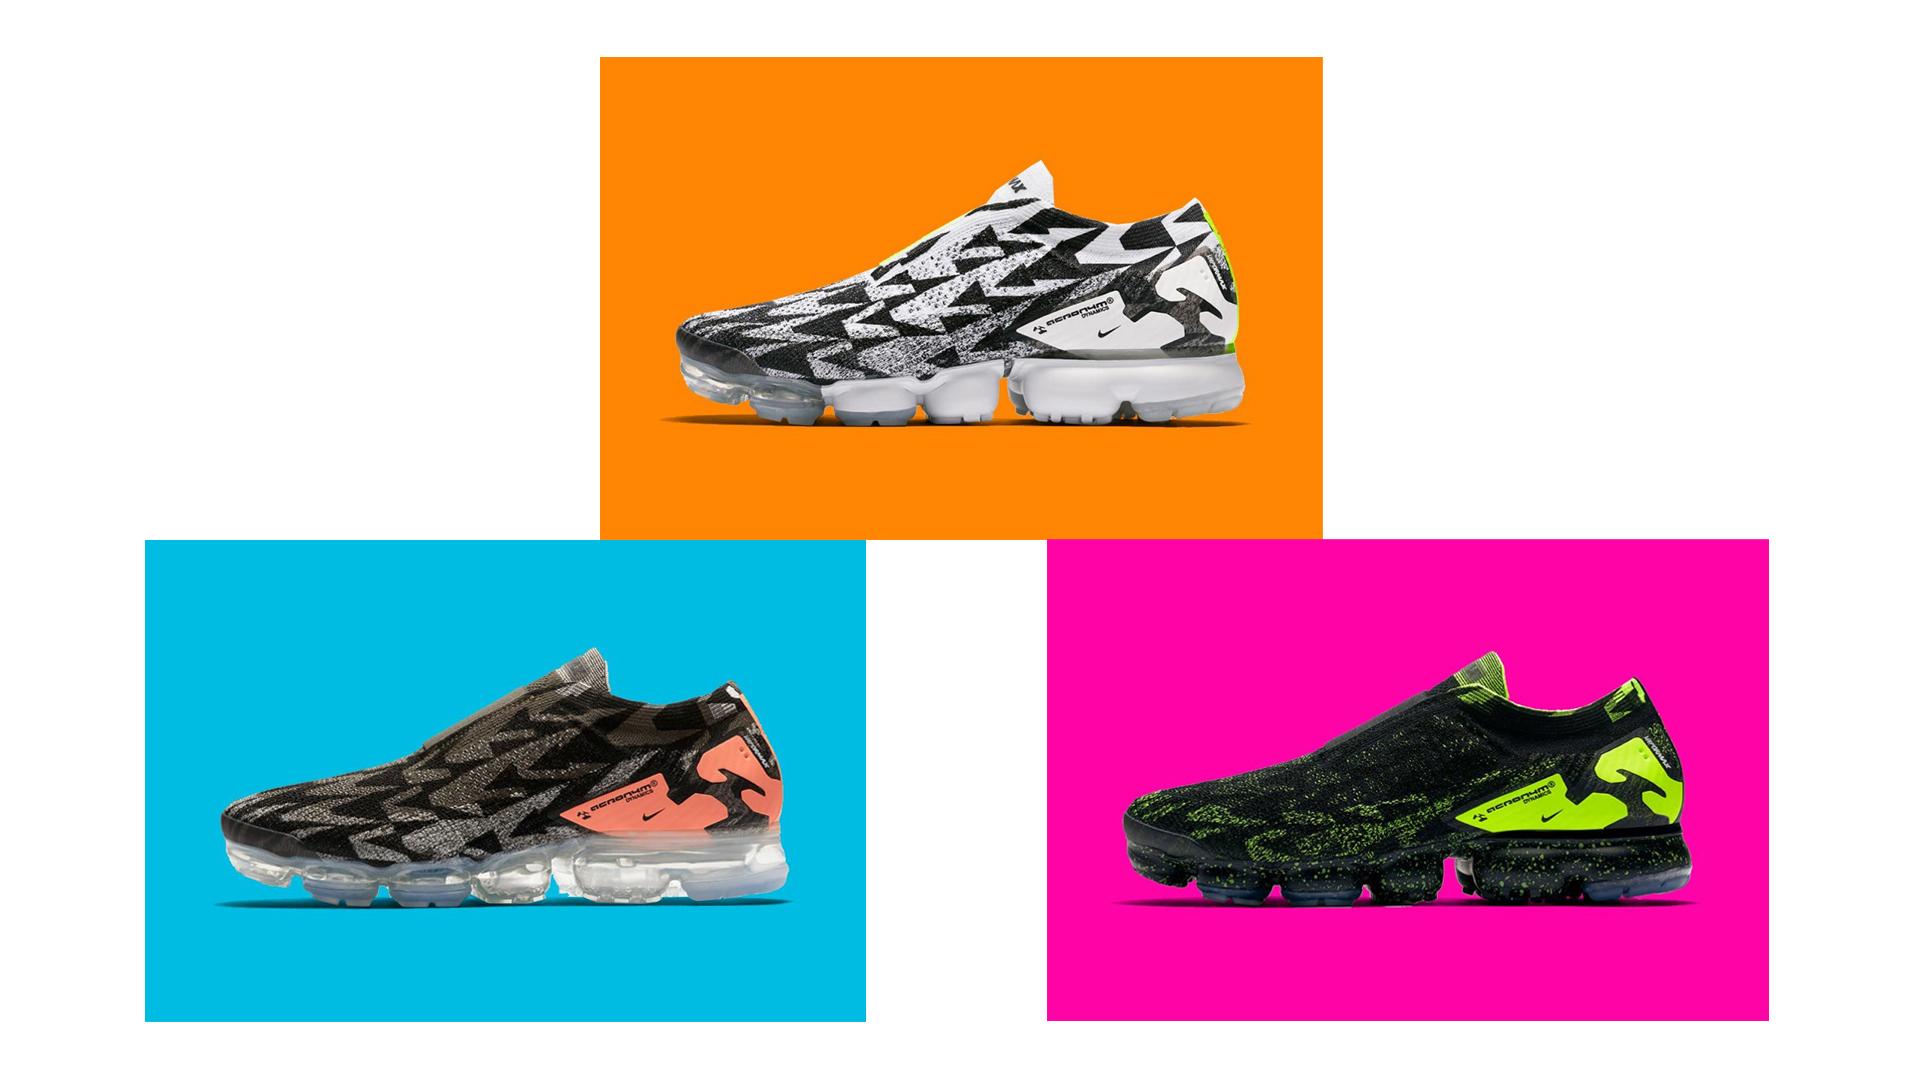 ACRONYM x Nike Vapormax Moc 2 // Kép: SneakerFreaker